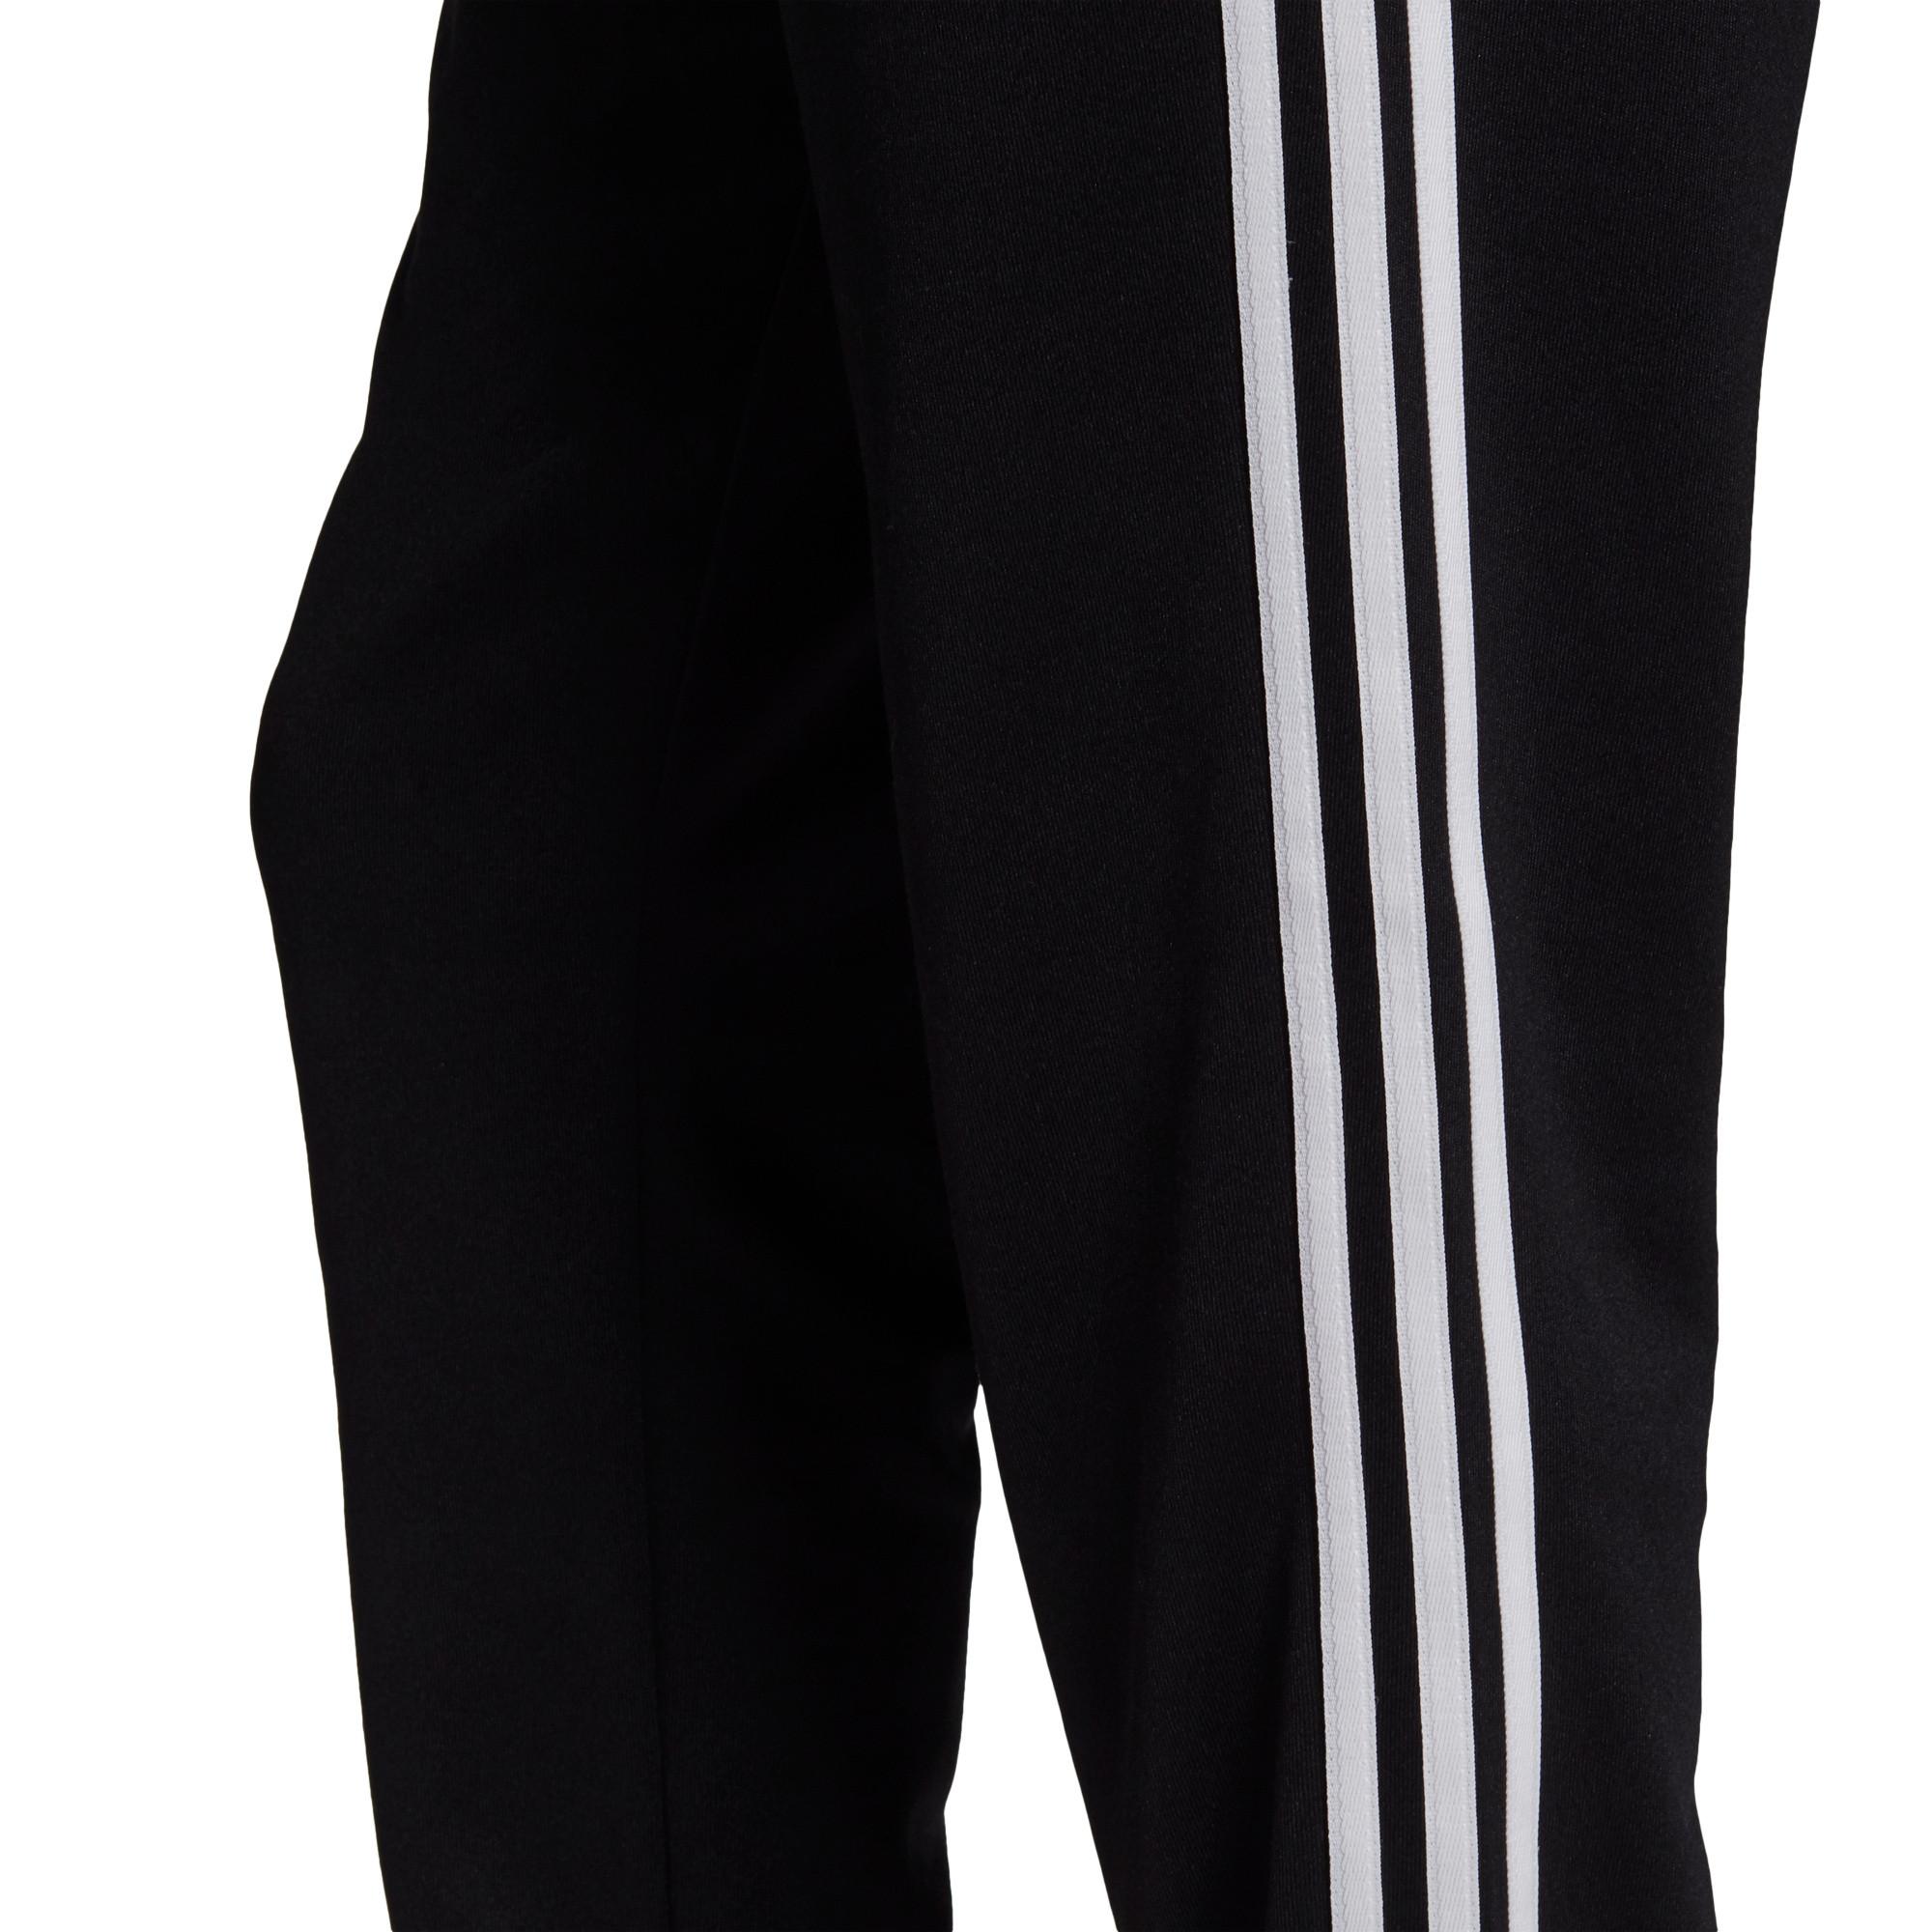 Pantaloni tuta adicolor Classics Primeblue SST, Bianco/Nero, large image number 3